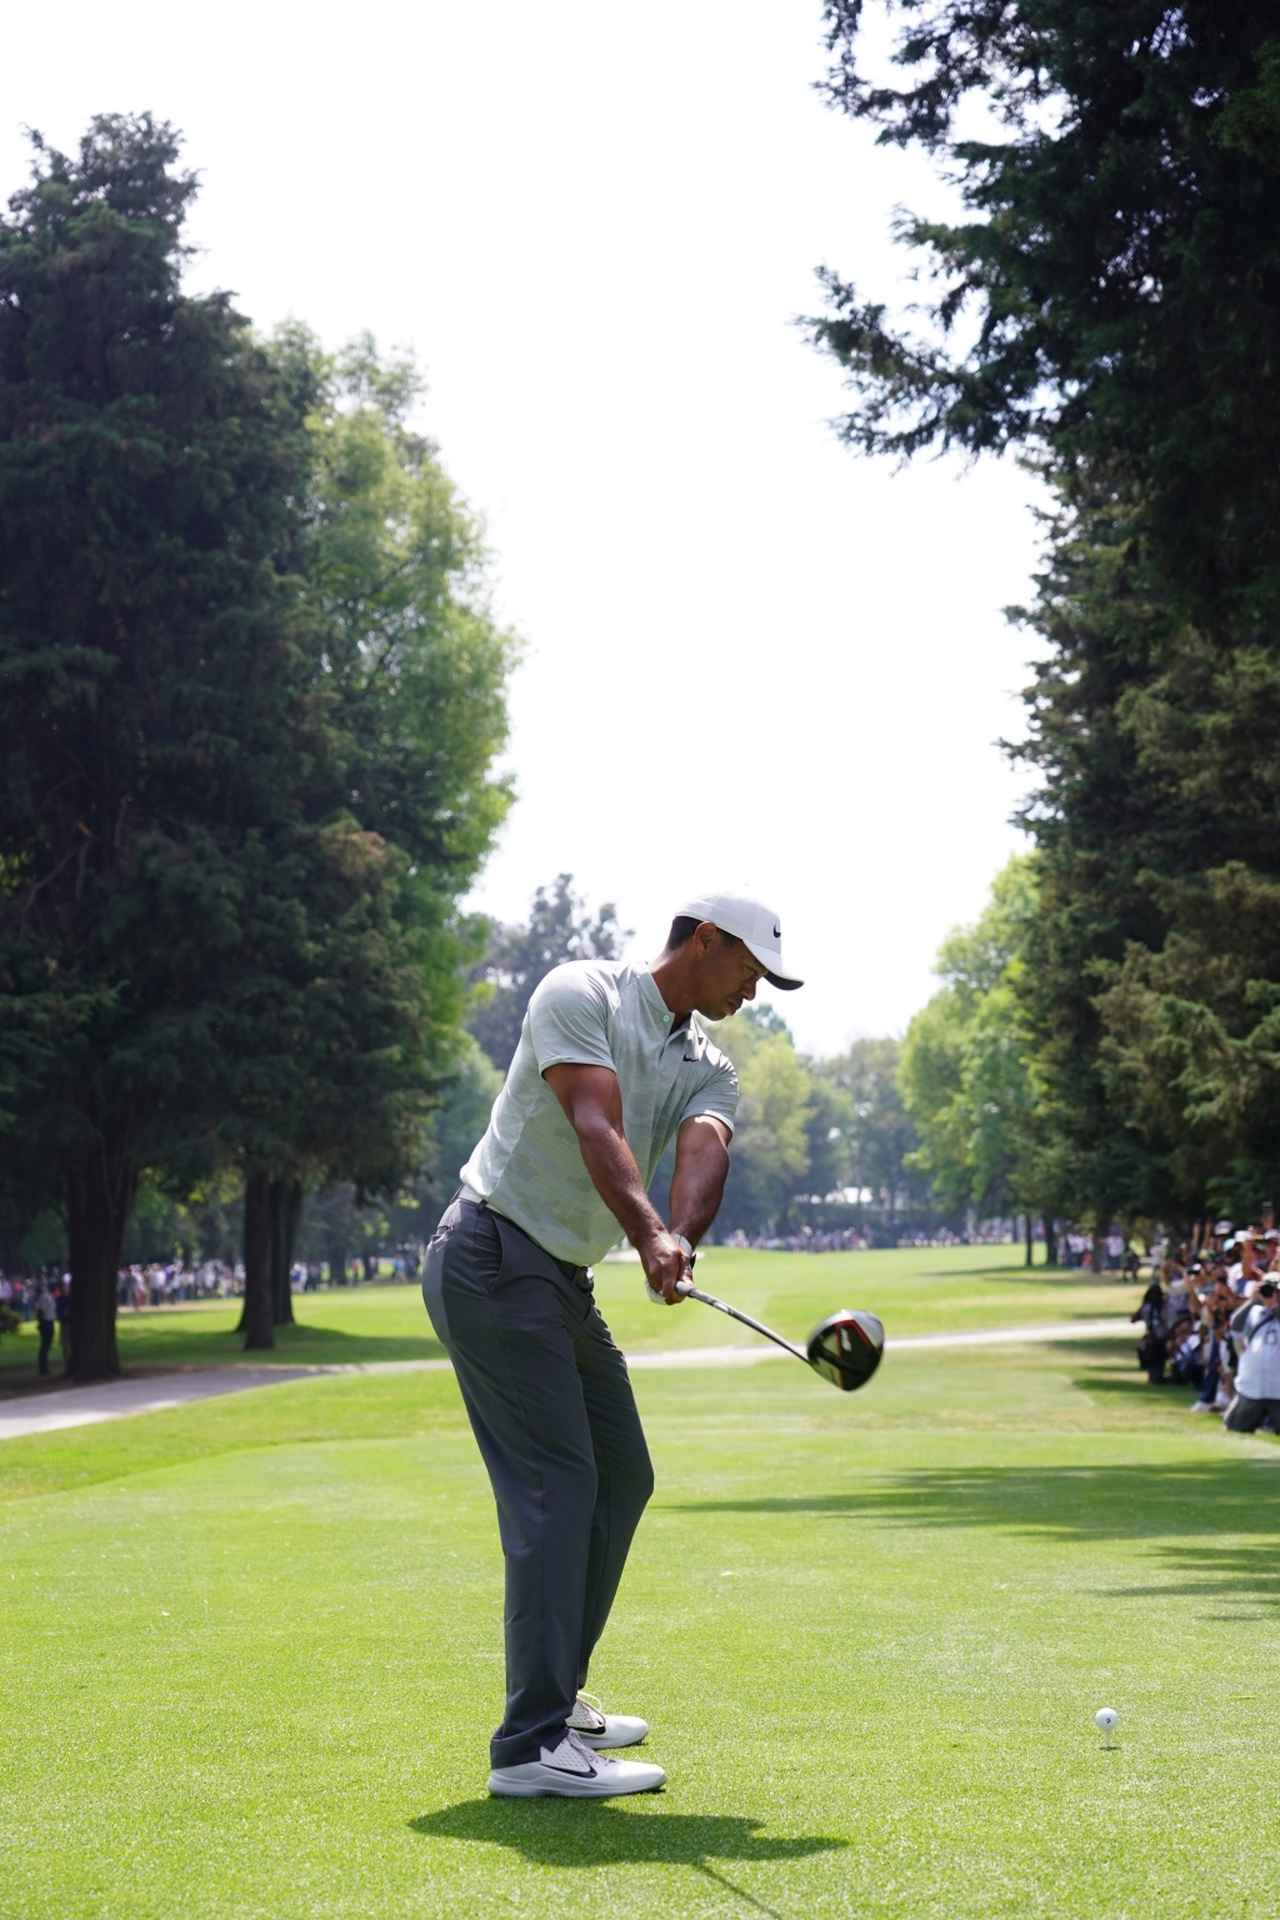 Images : 2番目の画像 - タイガー・ウッズのドライバー連続写真 - みんなのゴルフダイジェスト